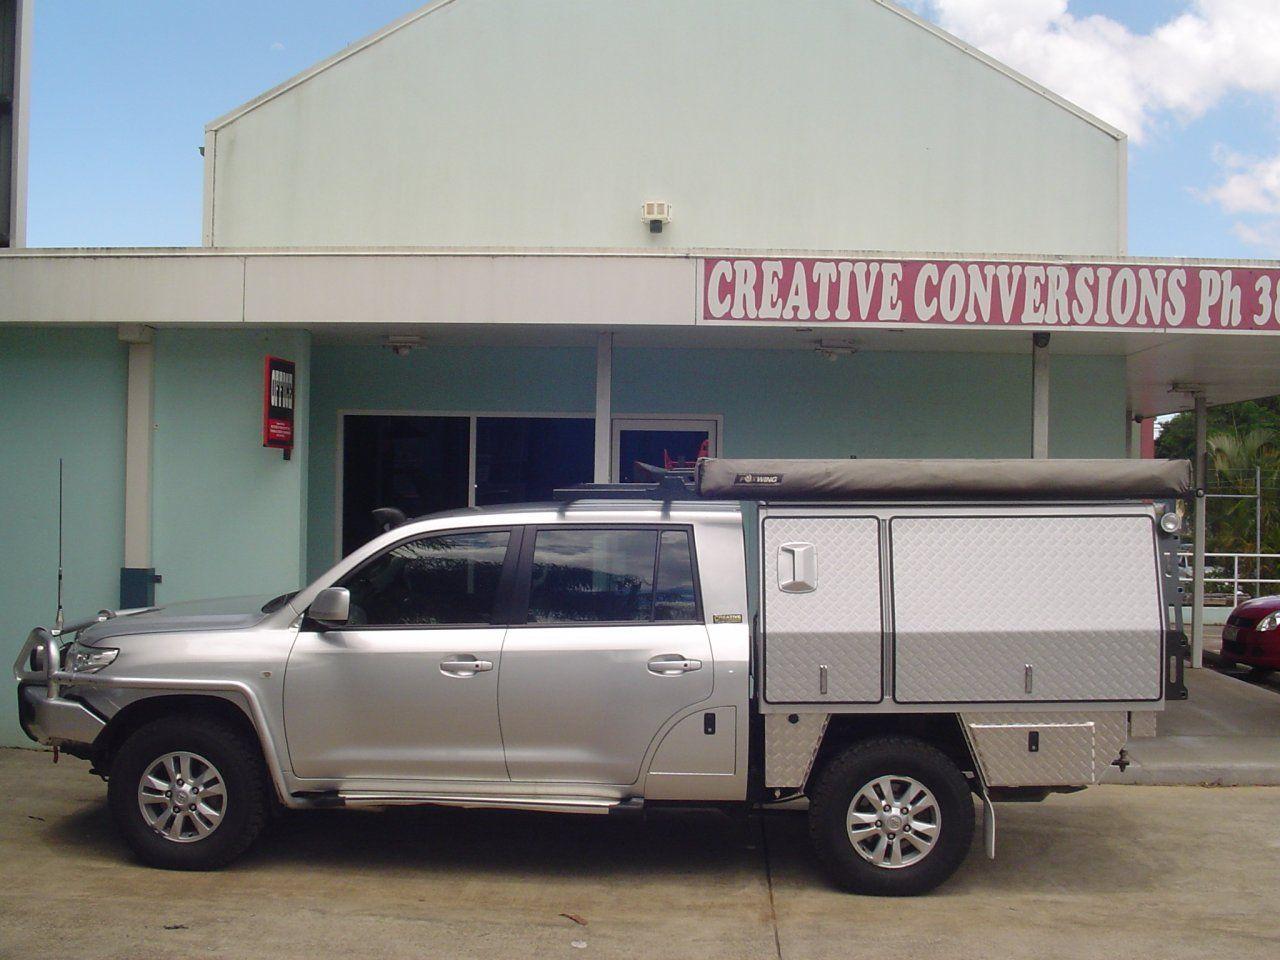 Creative conversions toyota landcruiser 200 series extended wheelbase ute conversion